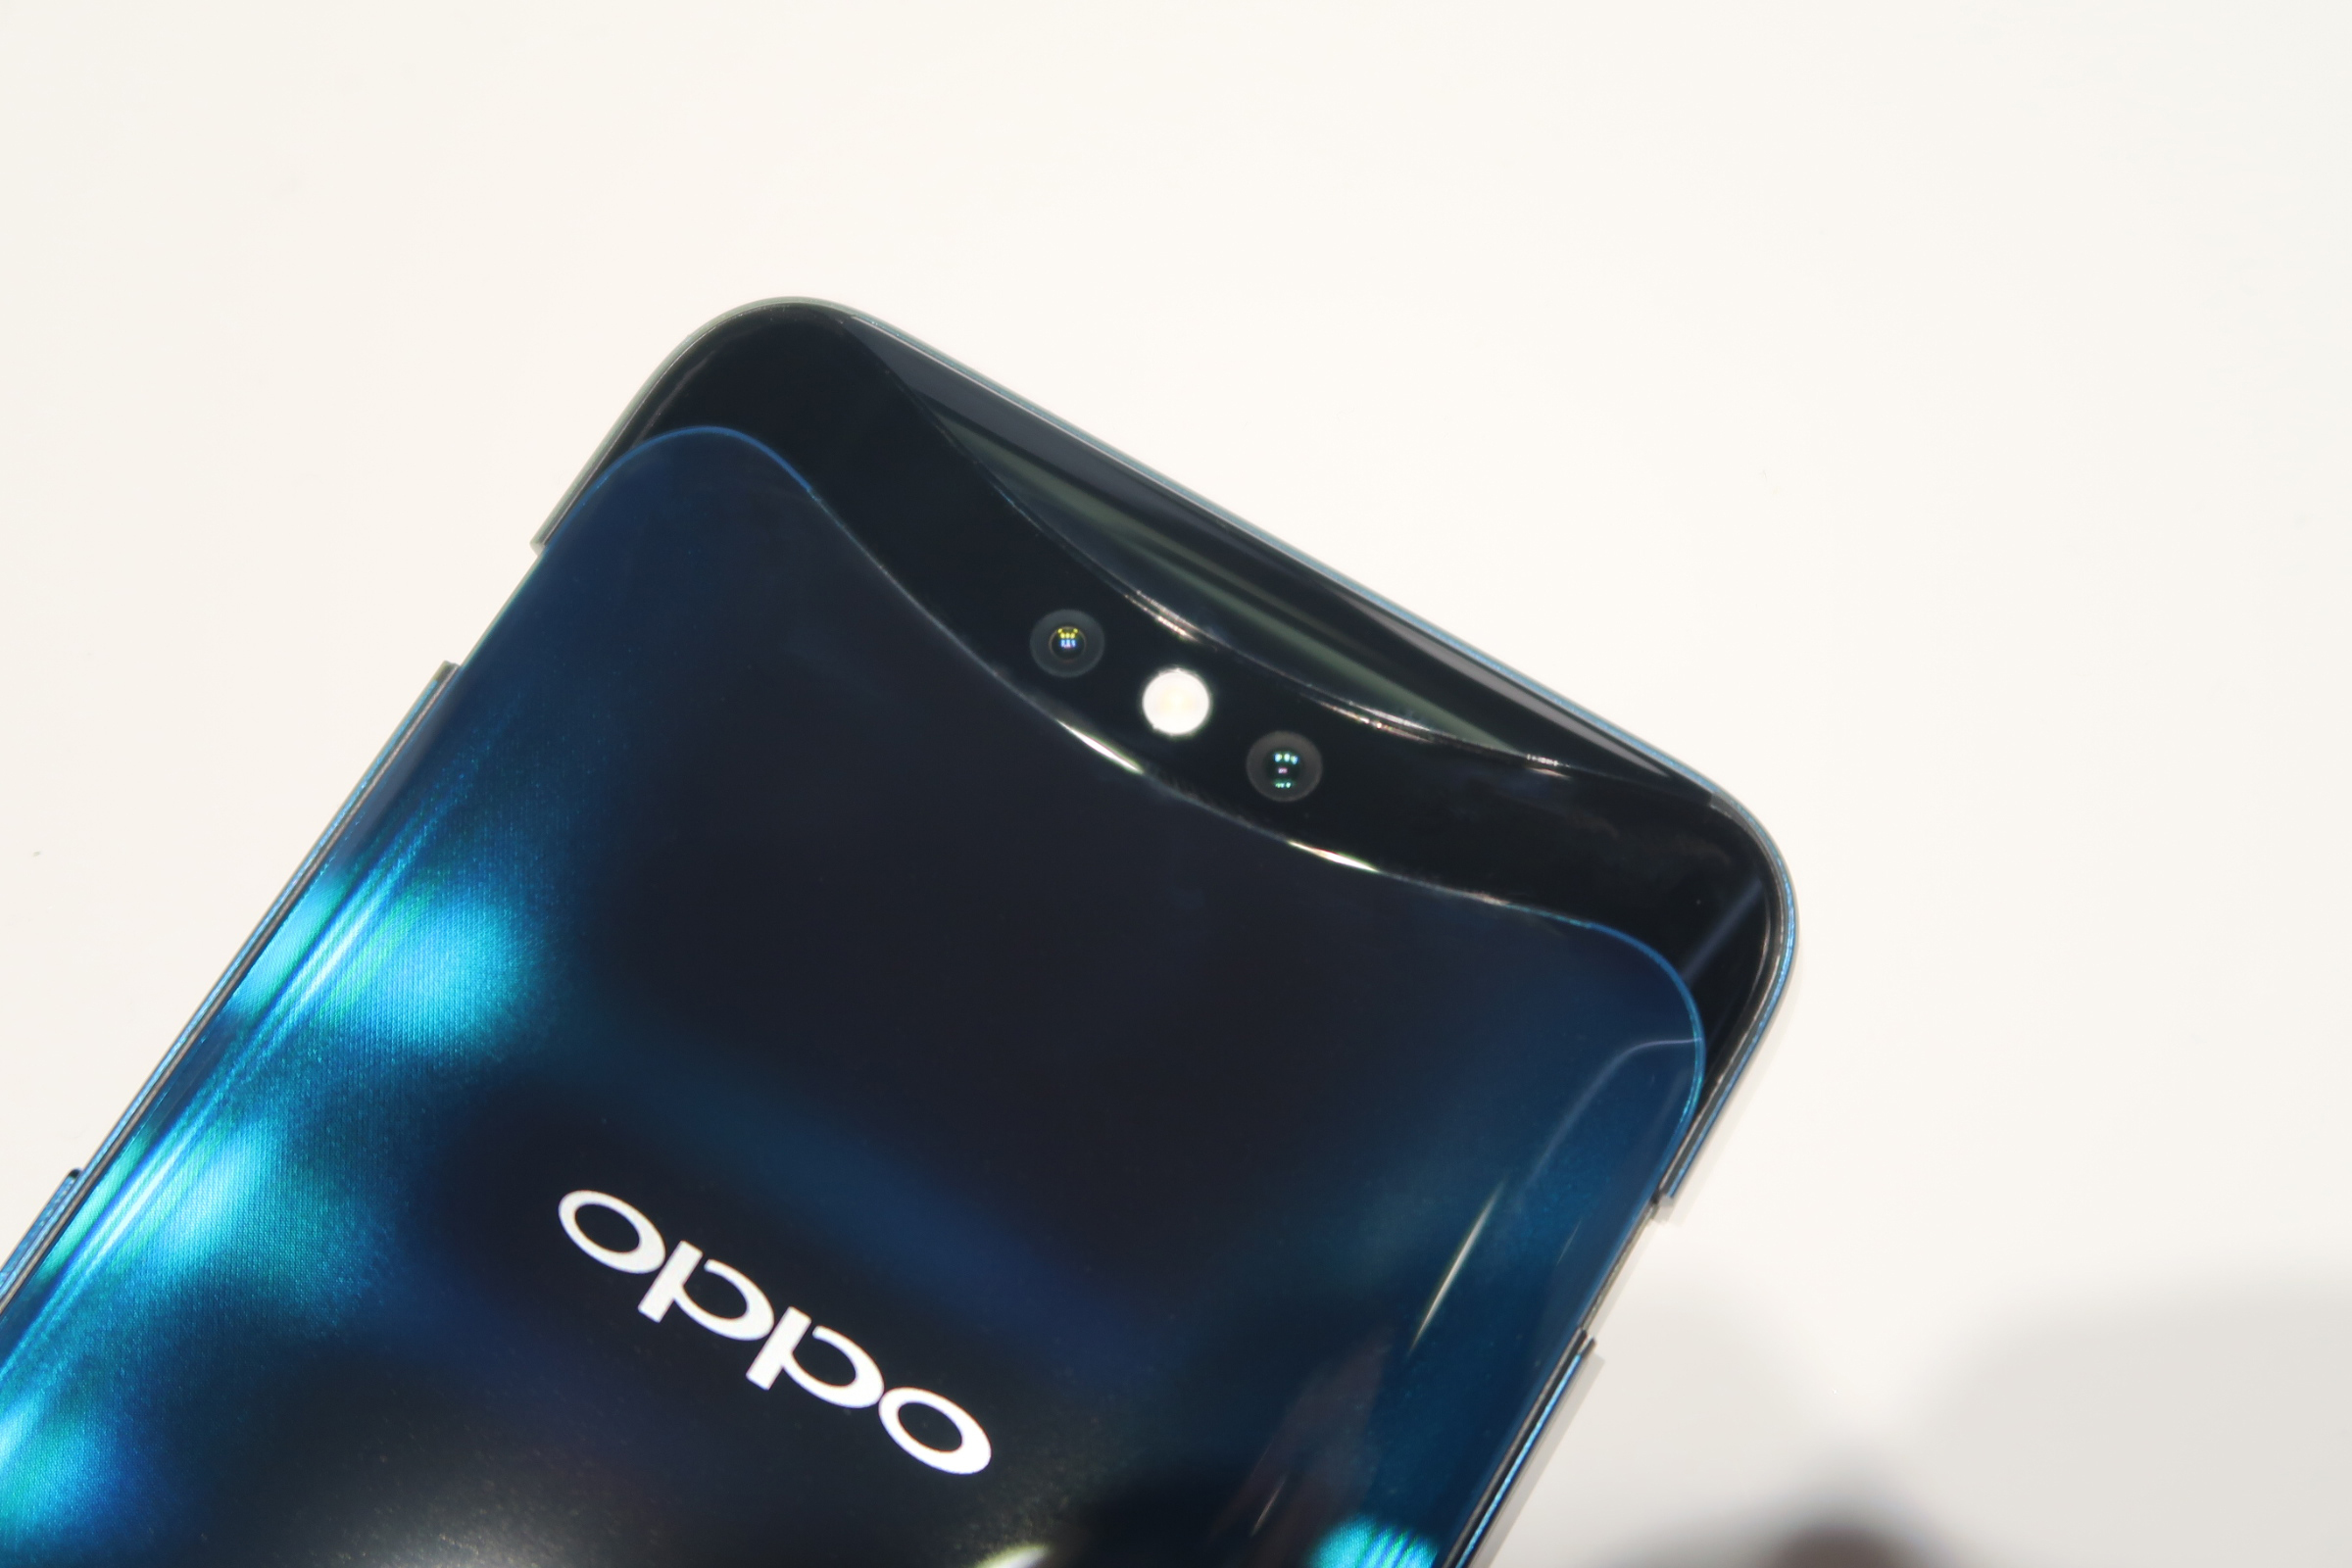 OPPO Find X上手:极致美感与科技突破的照片 - 10